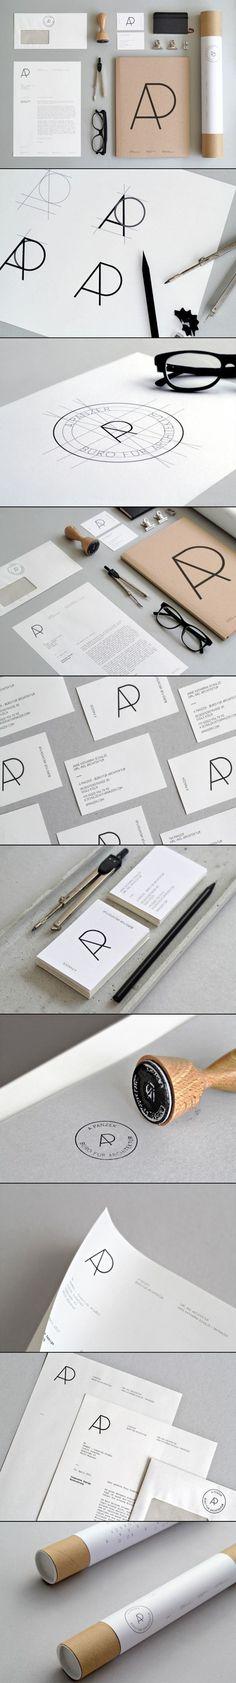 consistent branding #logo #identity #branding